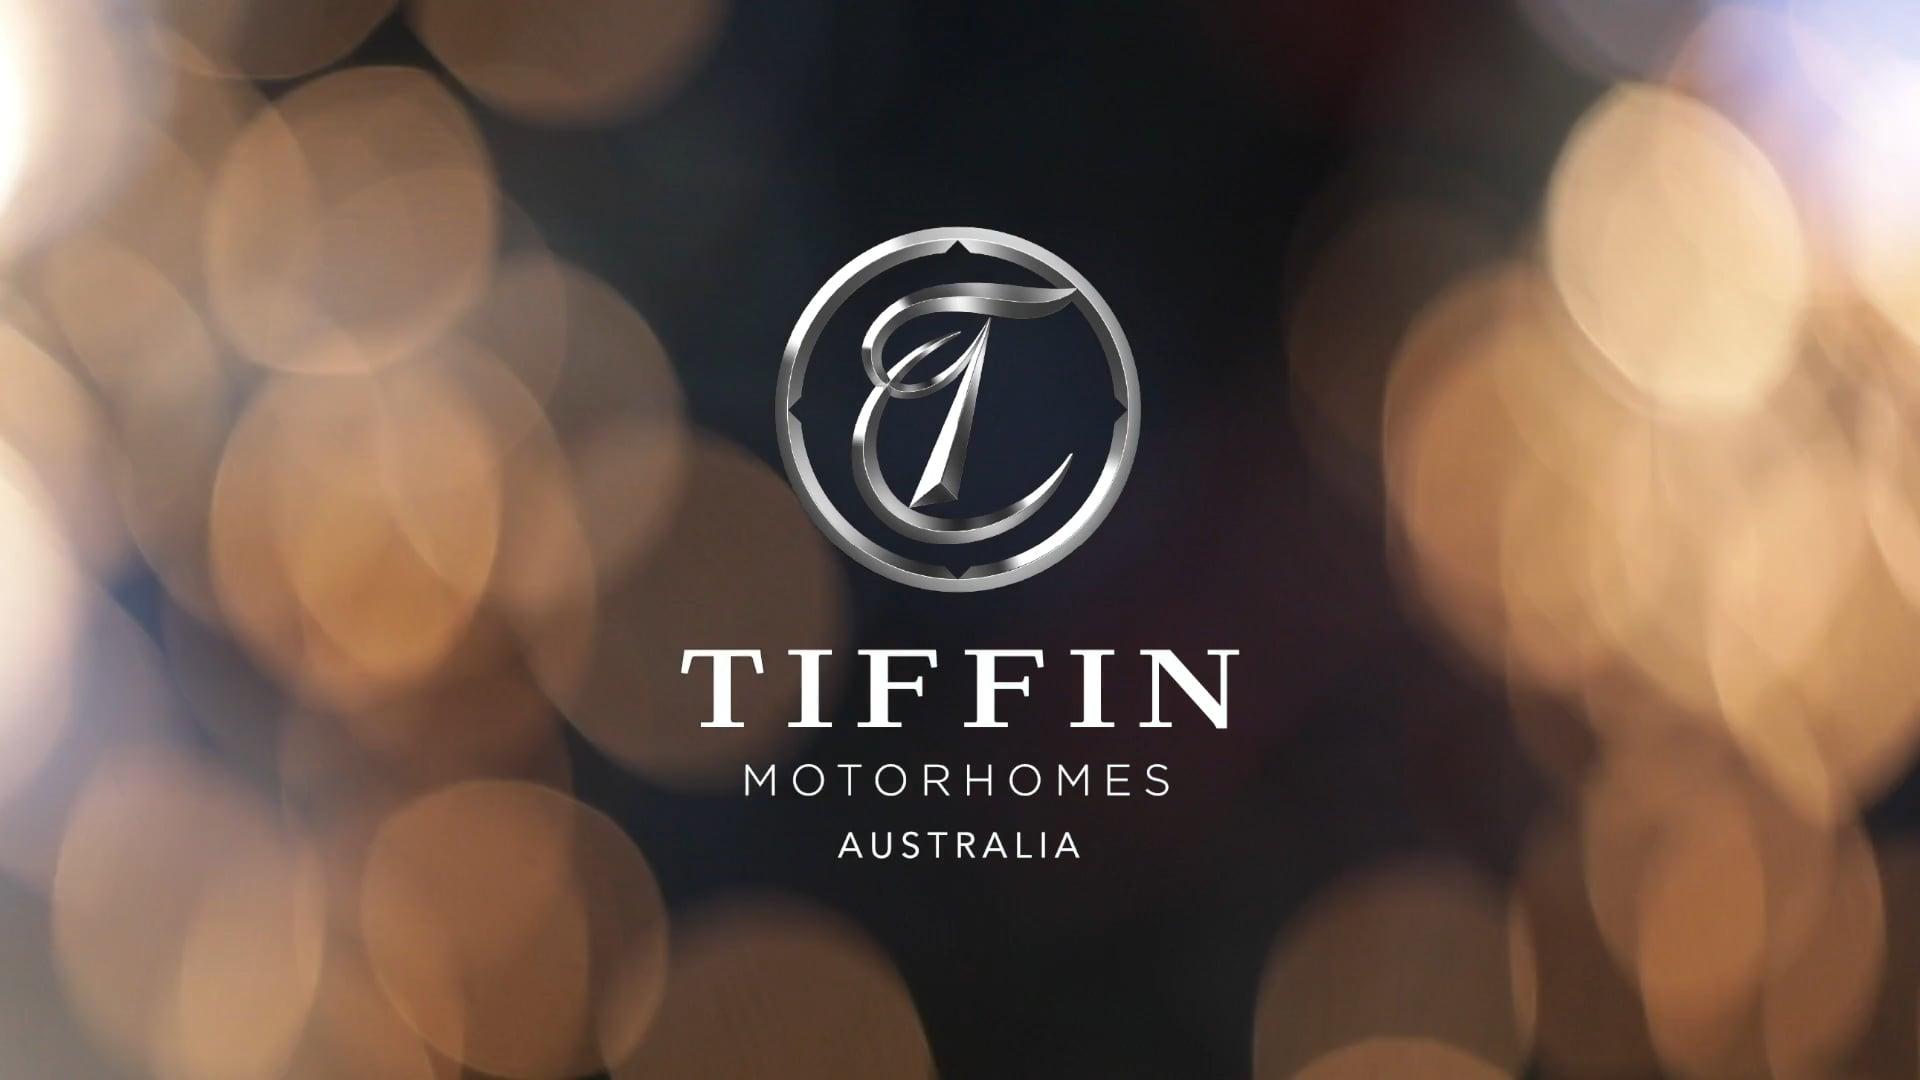 Tiffin Motorhomes Australia - Breeze